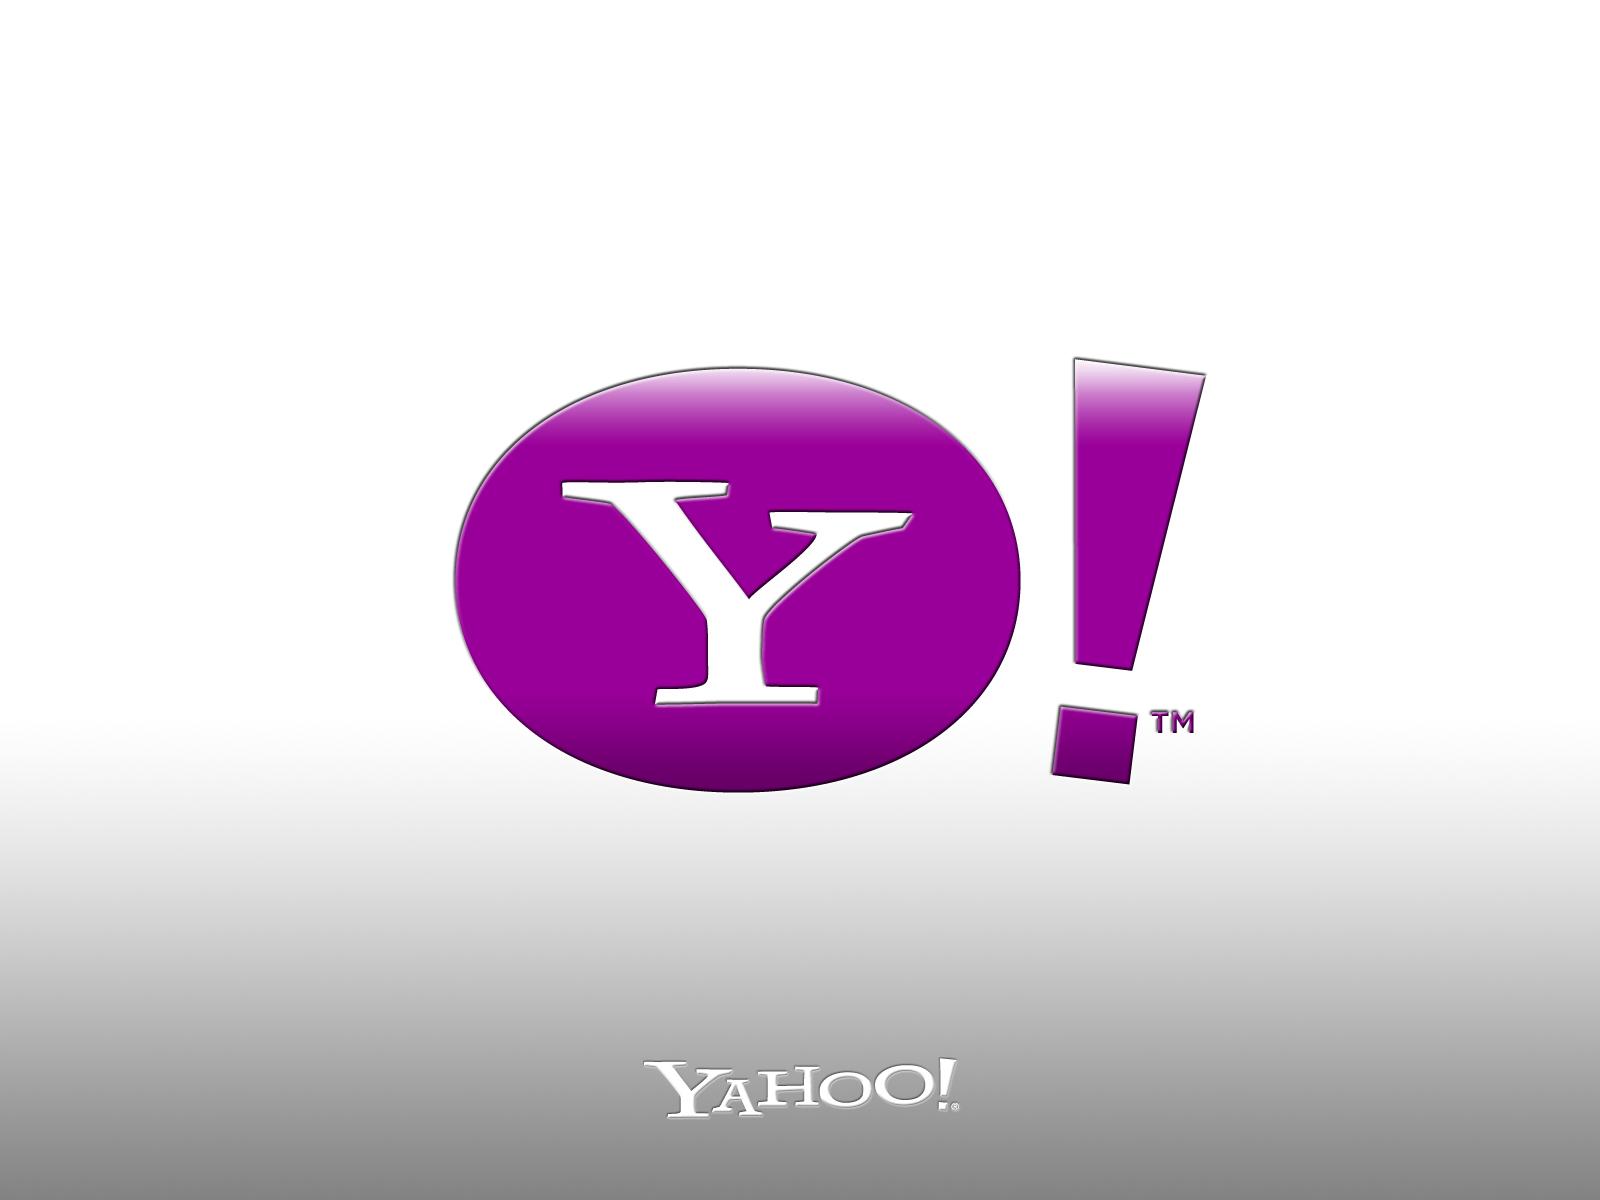 Yahoo Logo HD Wallpaper